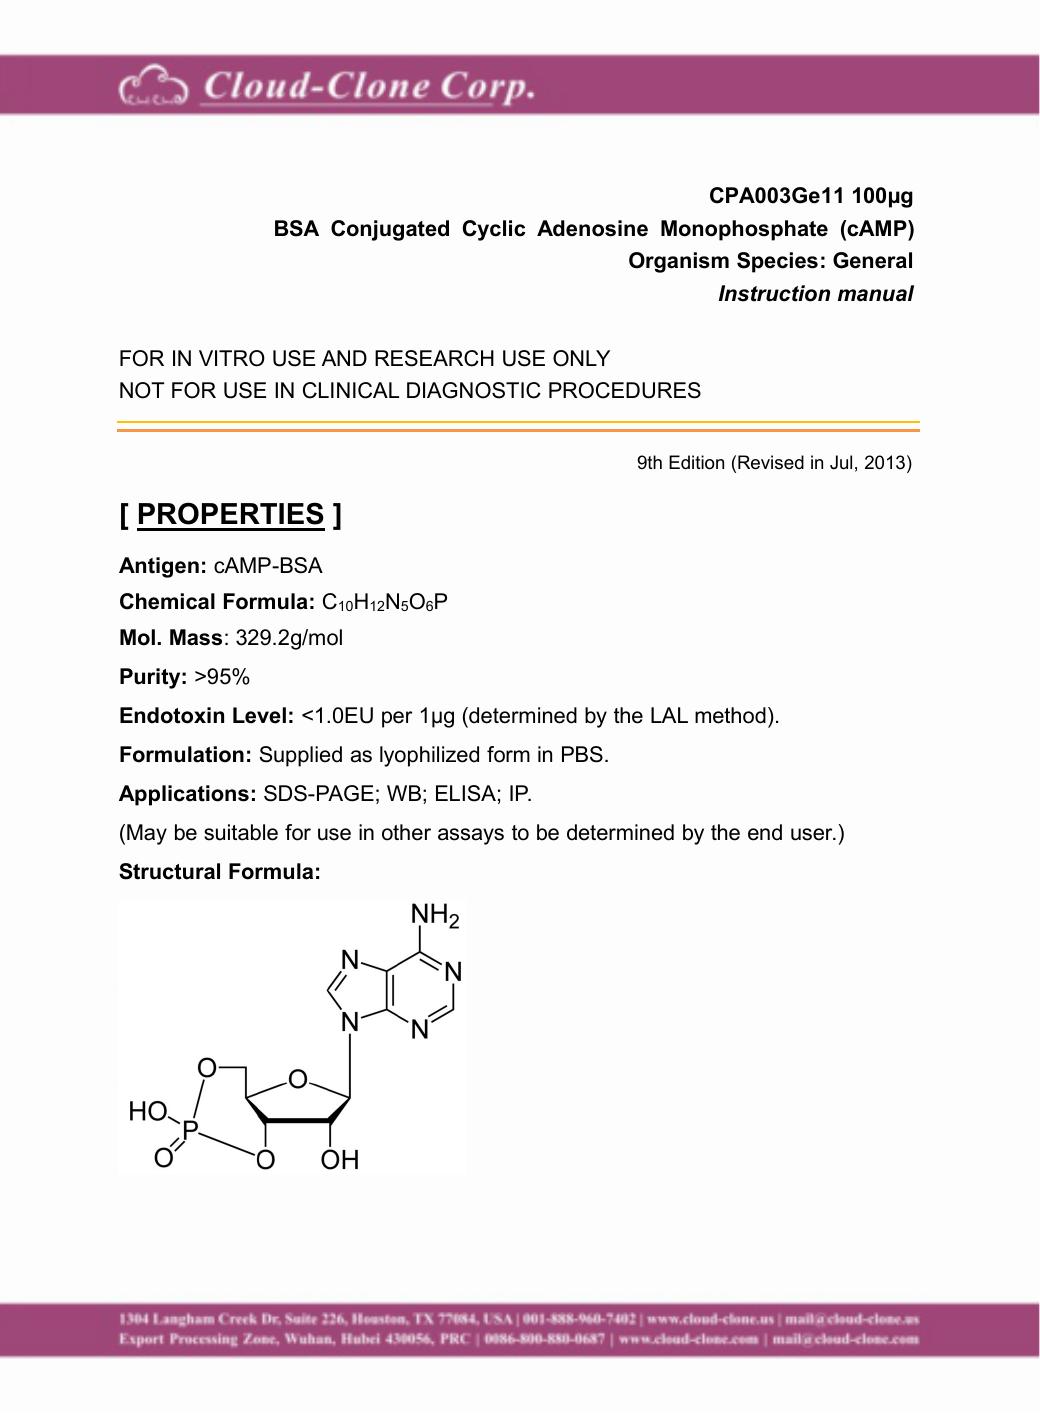 OVA Conjugated Cyclic Adenosine Monophosphate (cAMP)